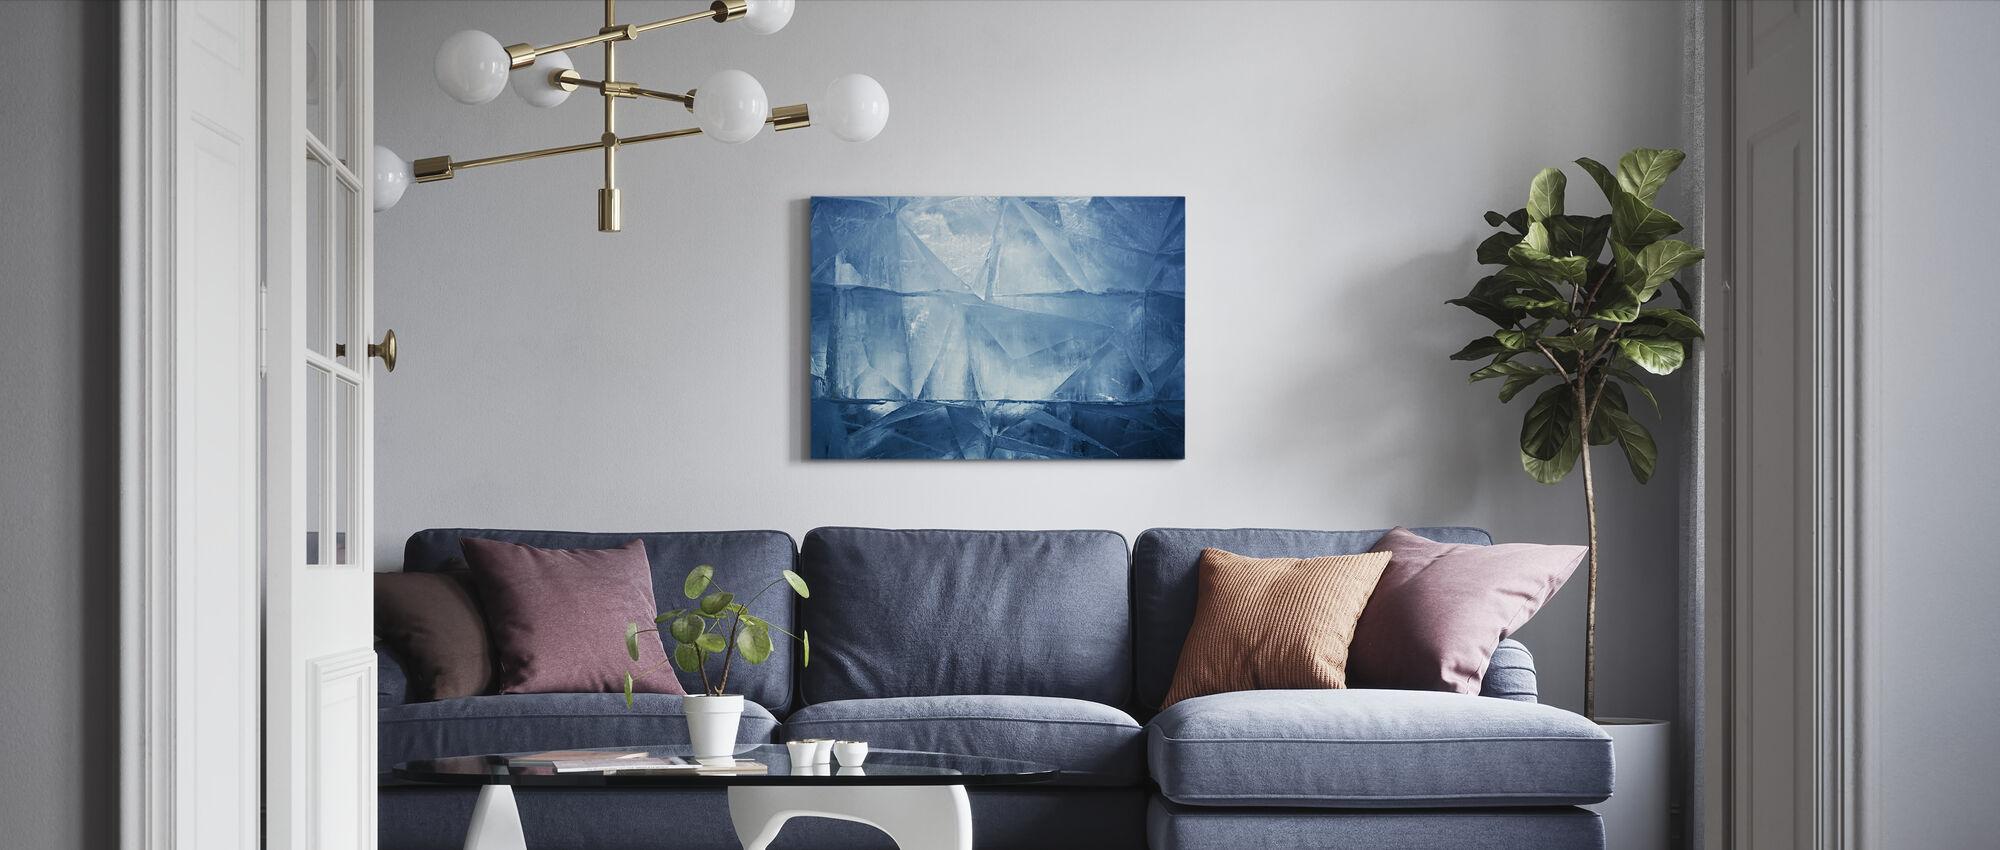 Blå is - Canvastavla - Vardagsrum